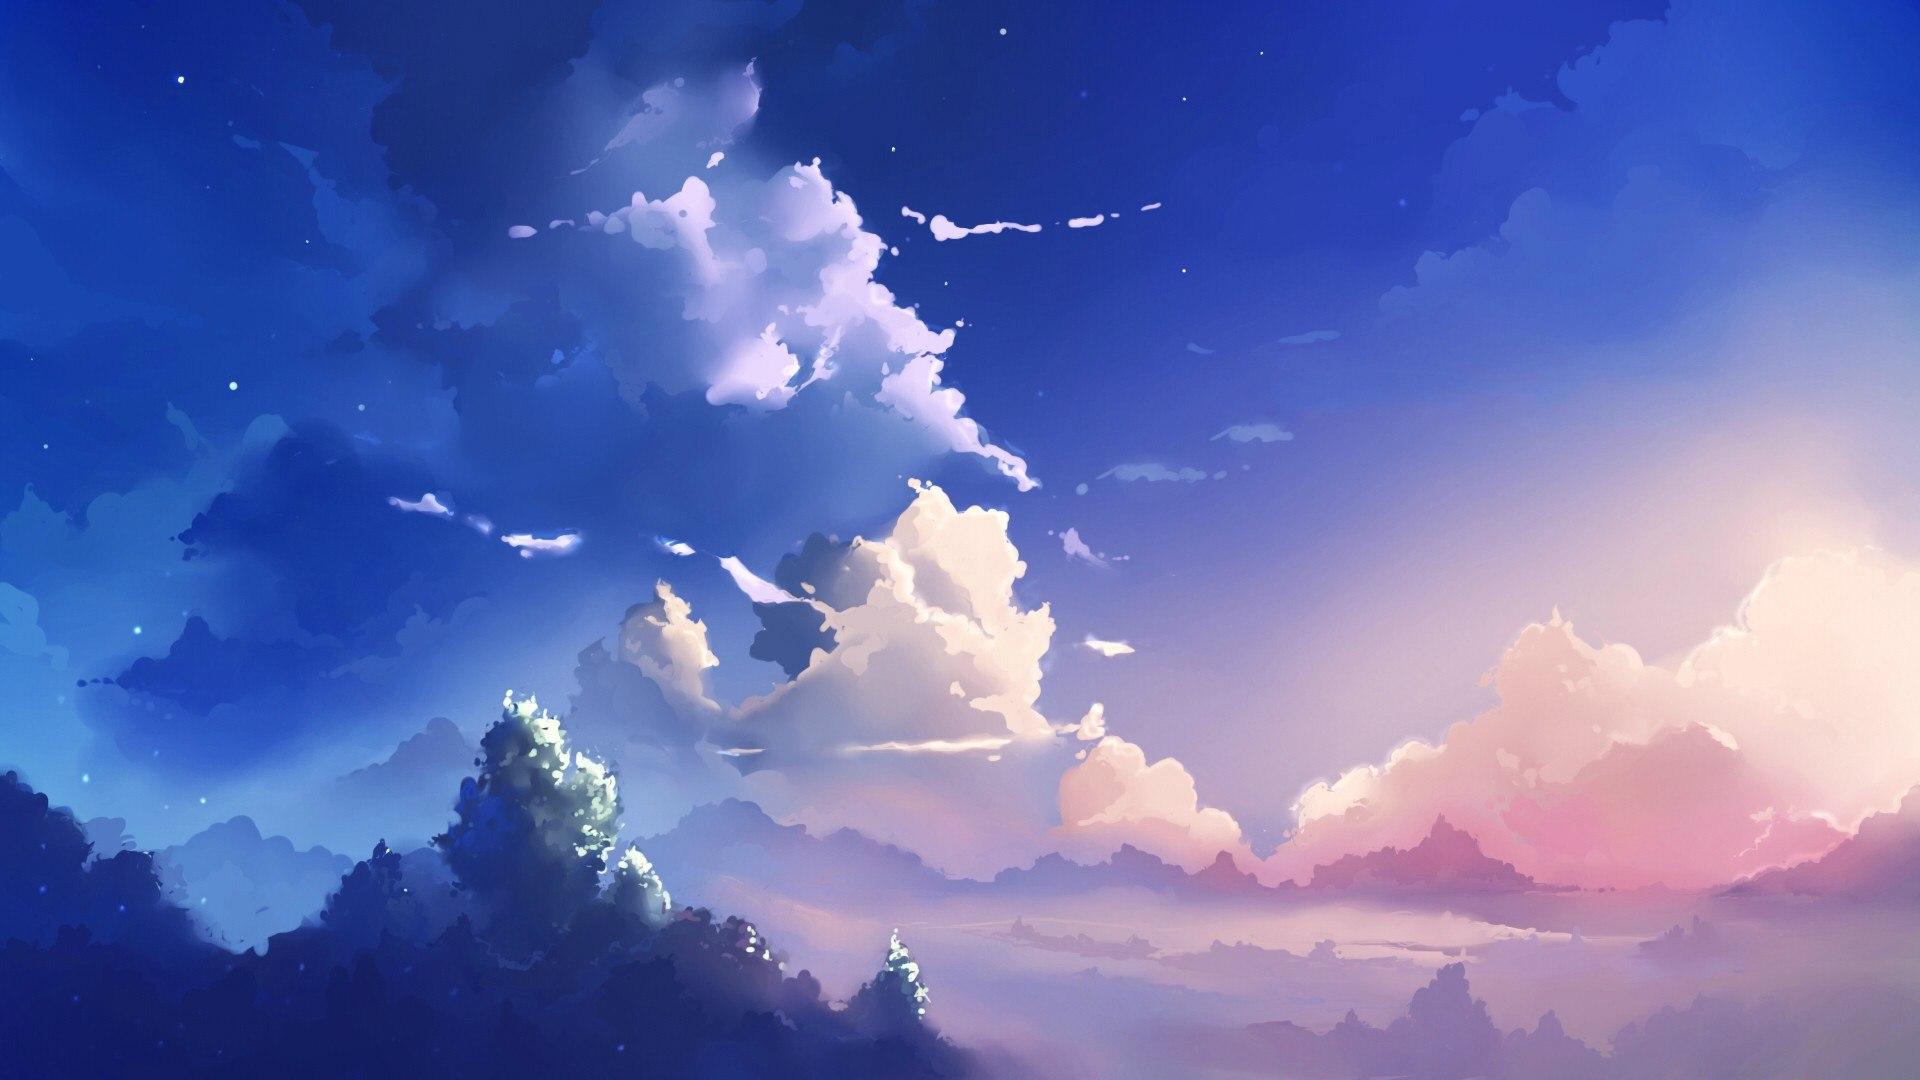 585462636 Anime Scenery Wallpaper